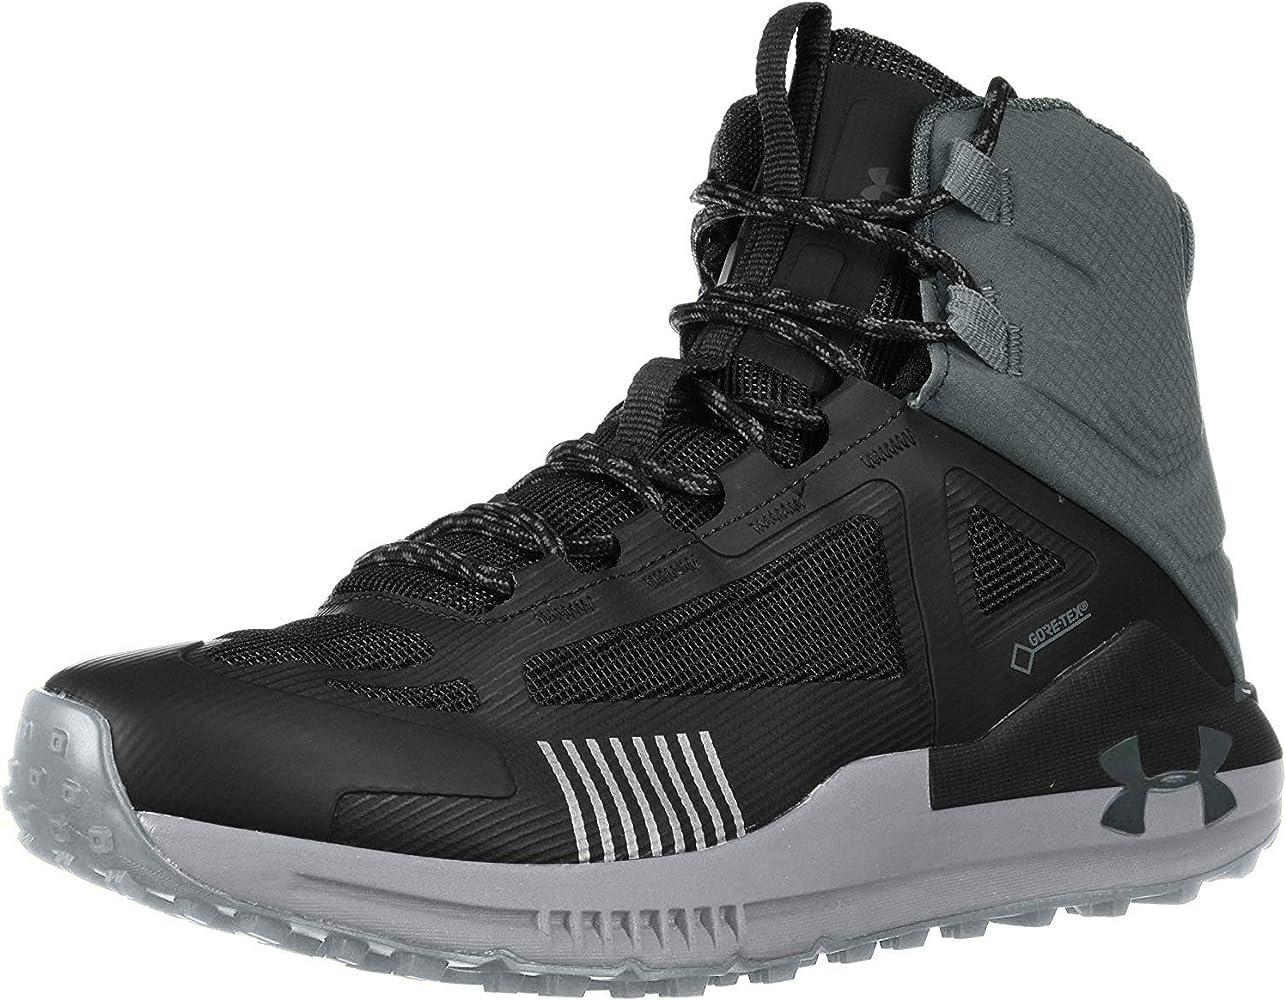 Adelantar hierba Nuevo significado  Amazon.com   Under Armour Men's Verge 2.0 Mid Gore-TEX Hiking Boot, Black  (003)/Pitch Gray, 8 M US   Hiking Boots